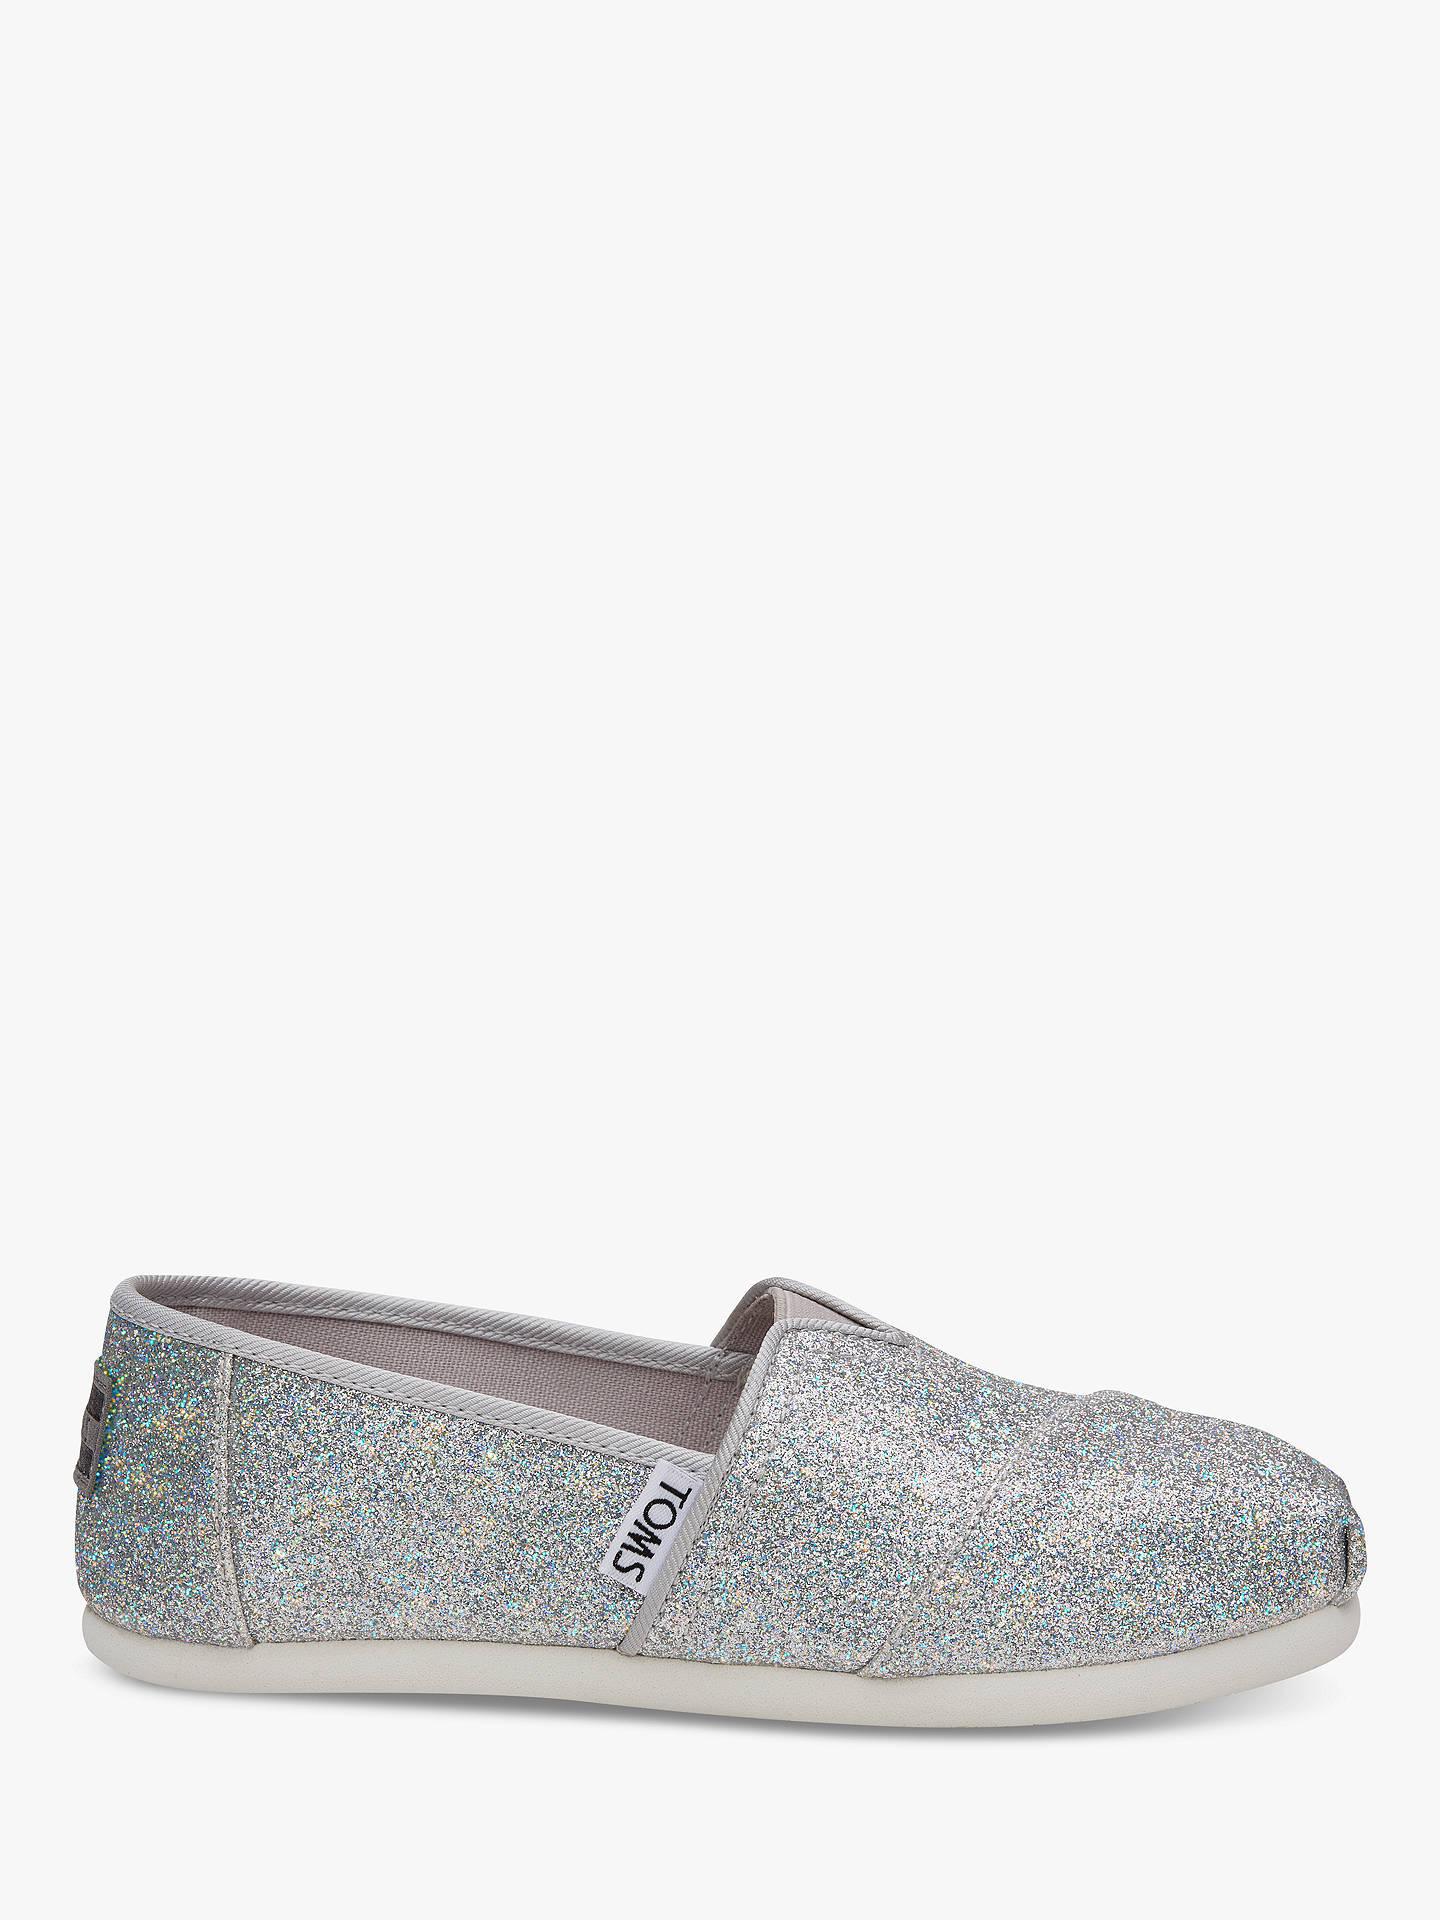 43516905c7b9 Buy TOMS Children s Alpagartas Glitter Casual Shoes